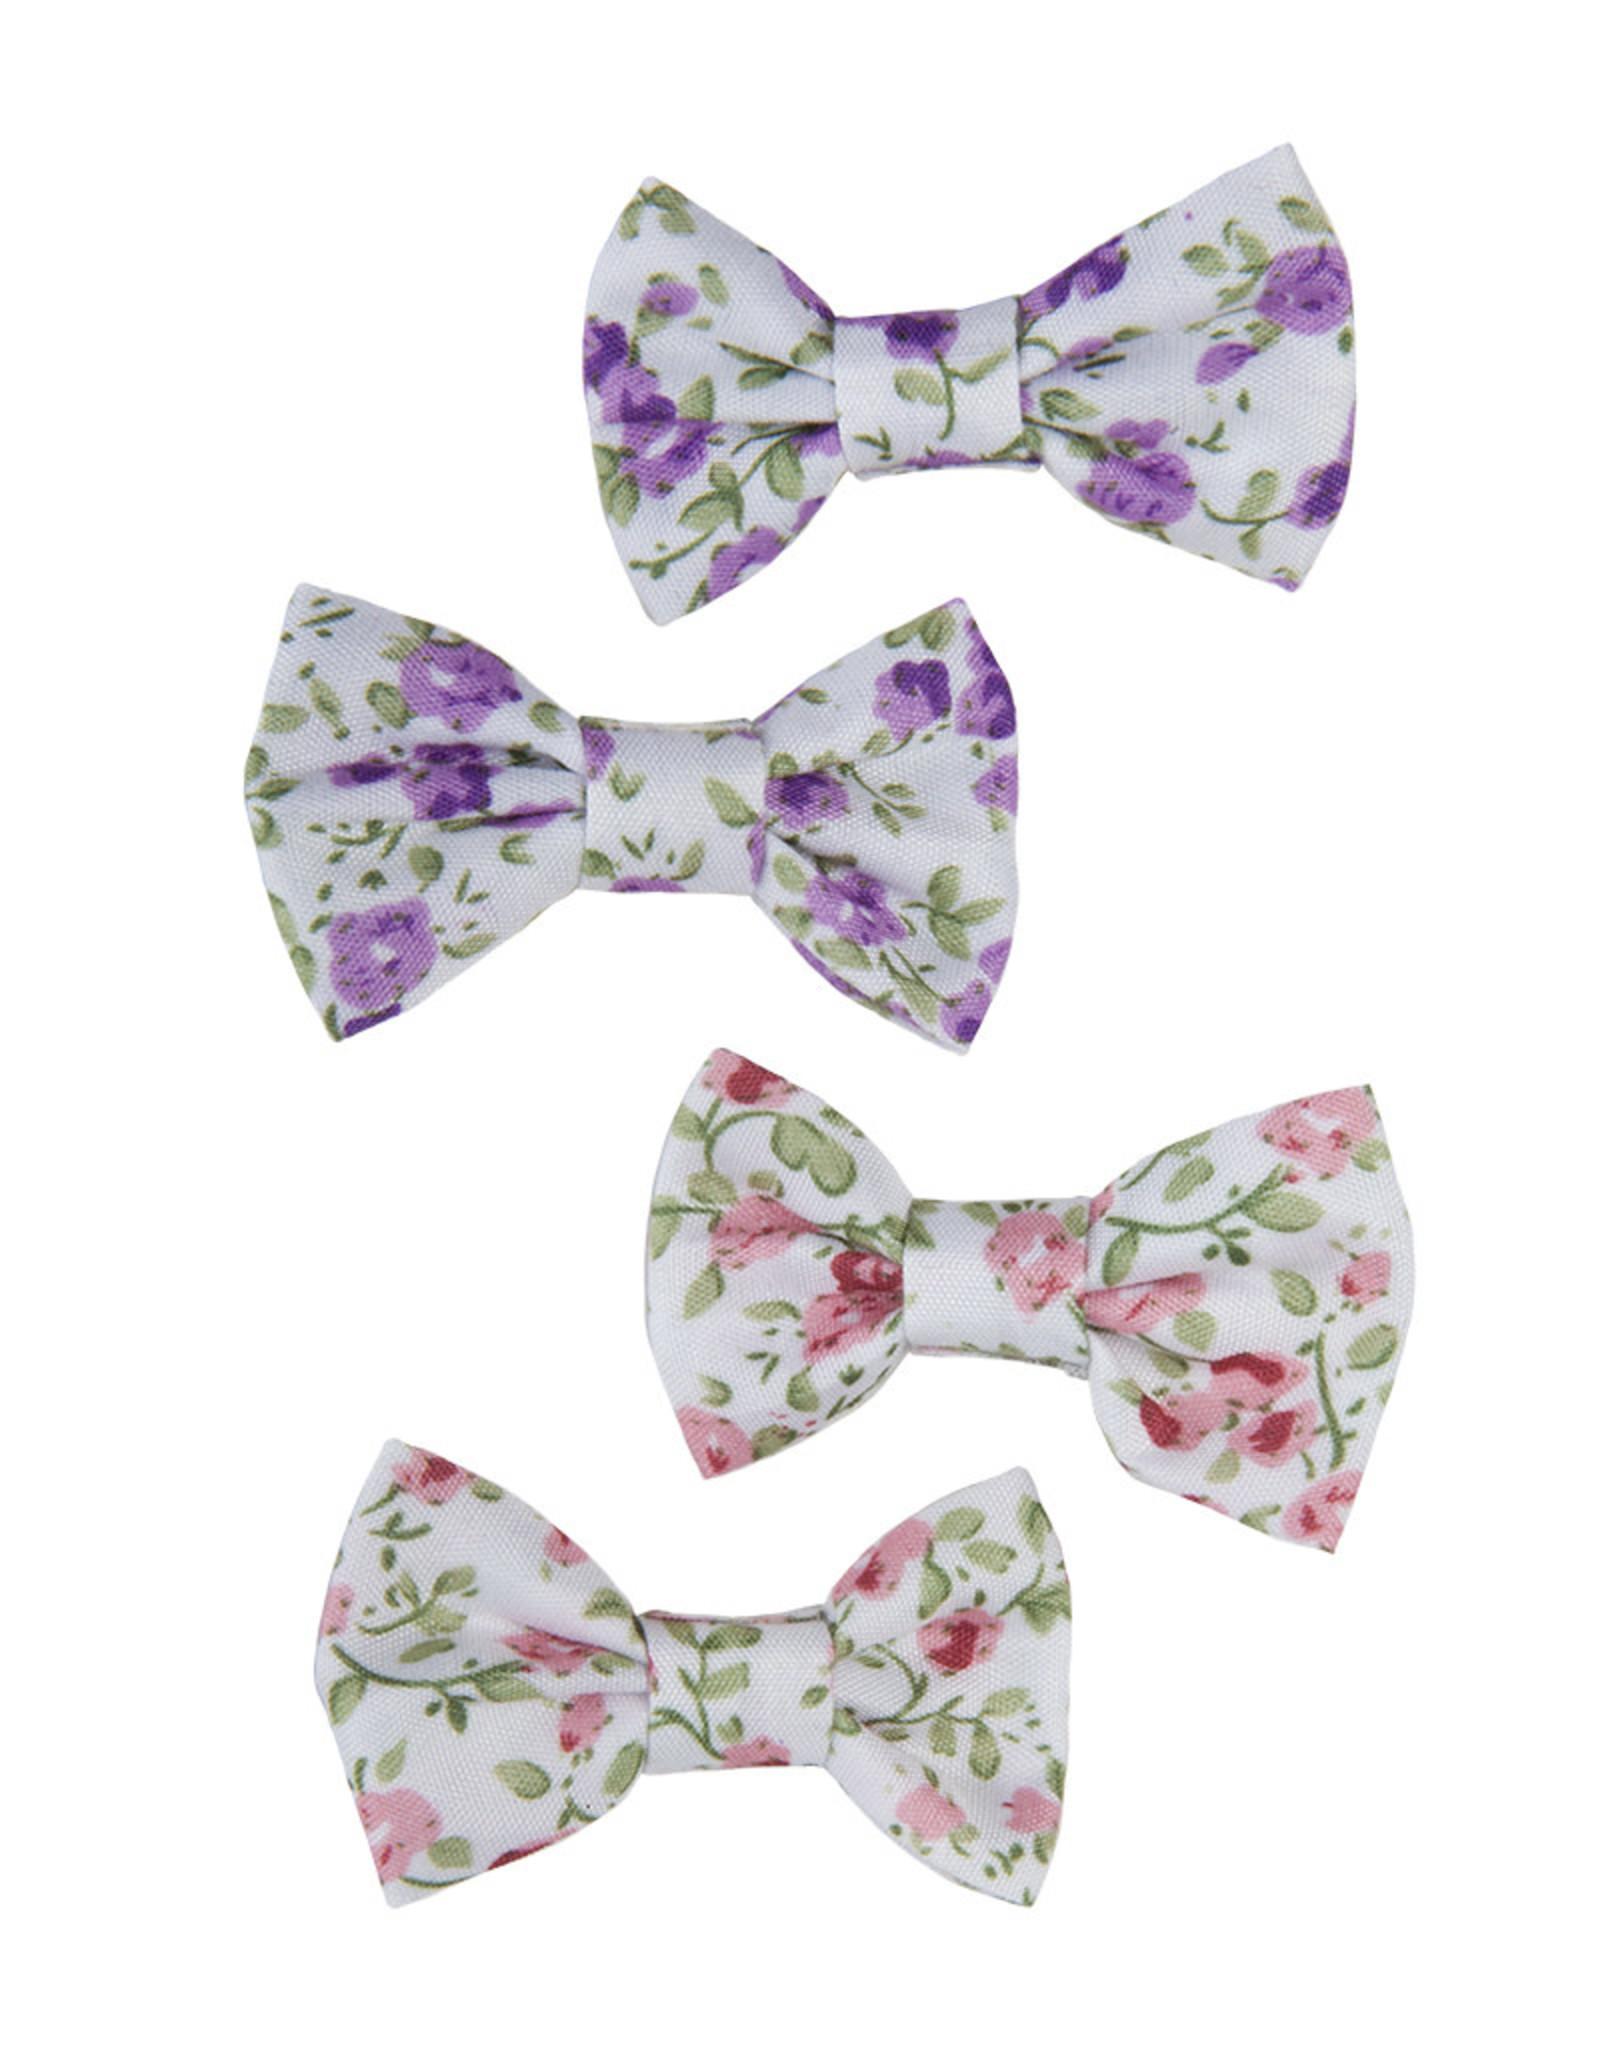 Creative Education Boutique Liberty Mini Bow Hairclips, 2 Pcs, Assorted